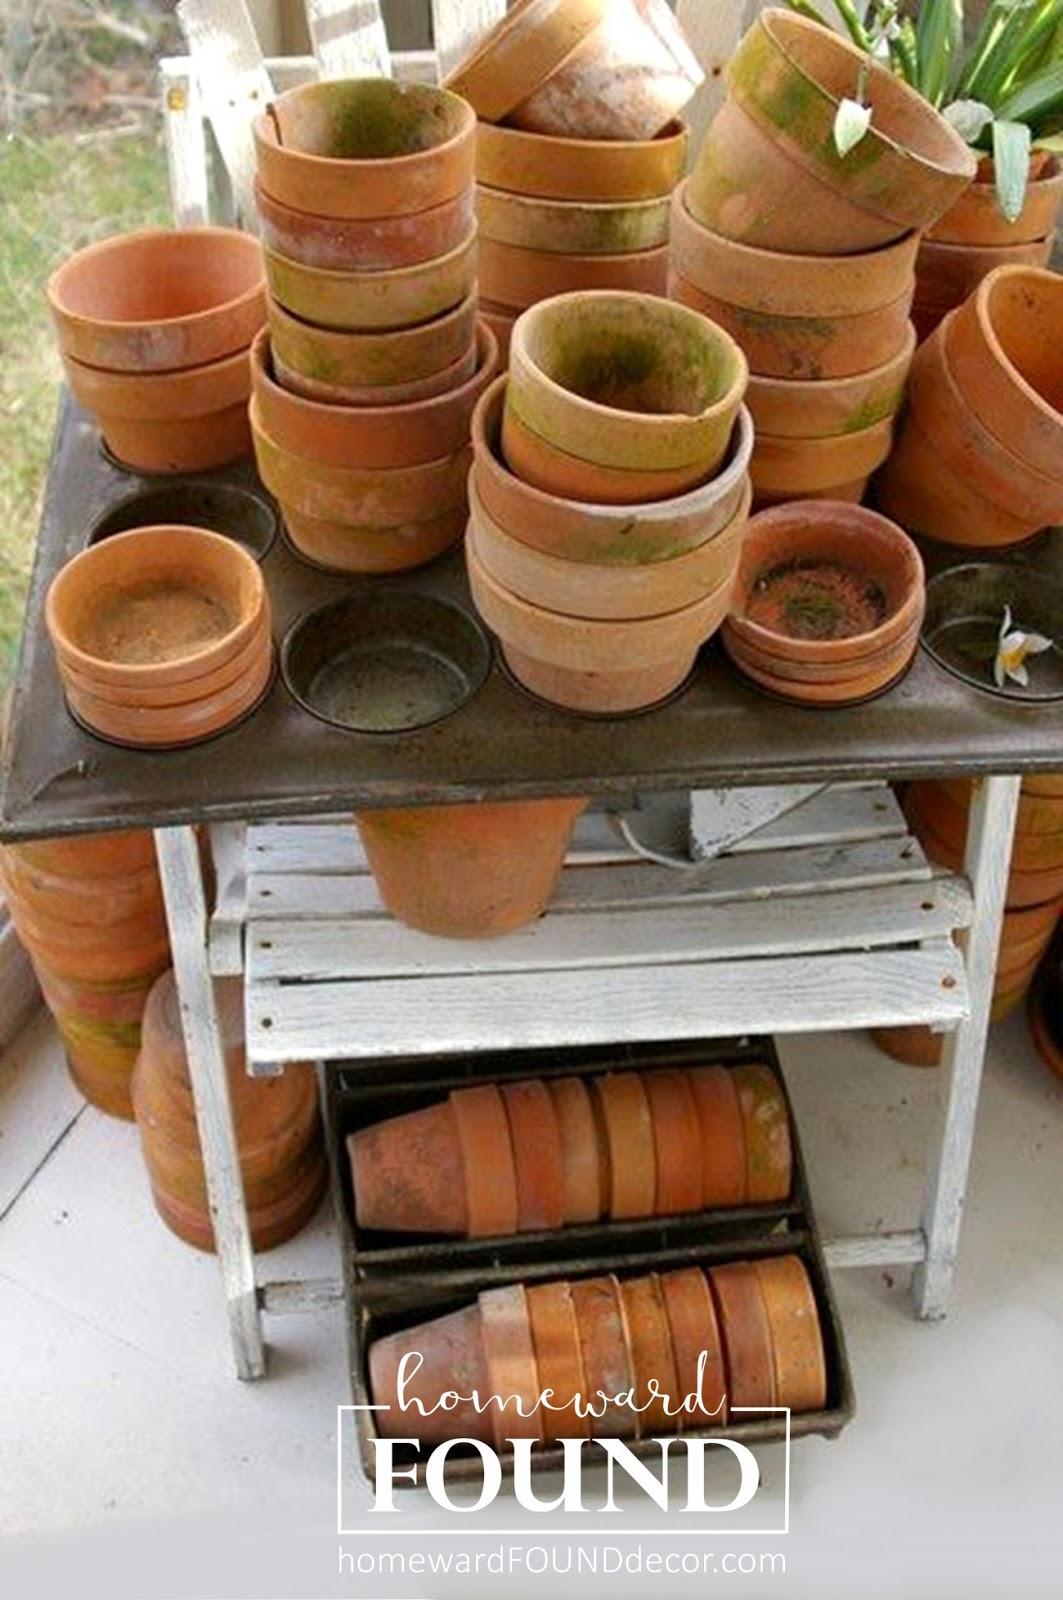 Raid the Garden Shed for Spring Decor! homewardFOUND decor